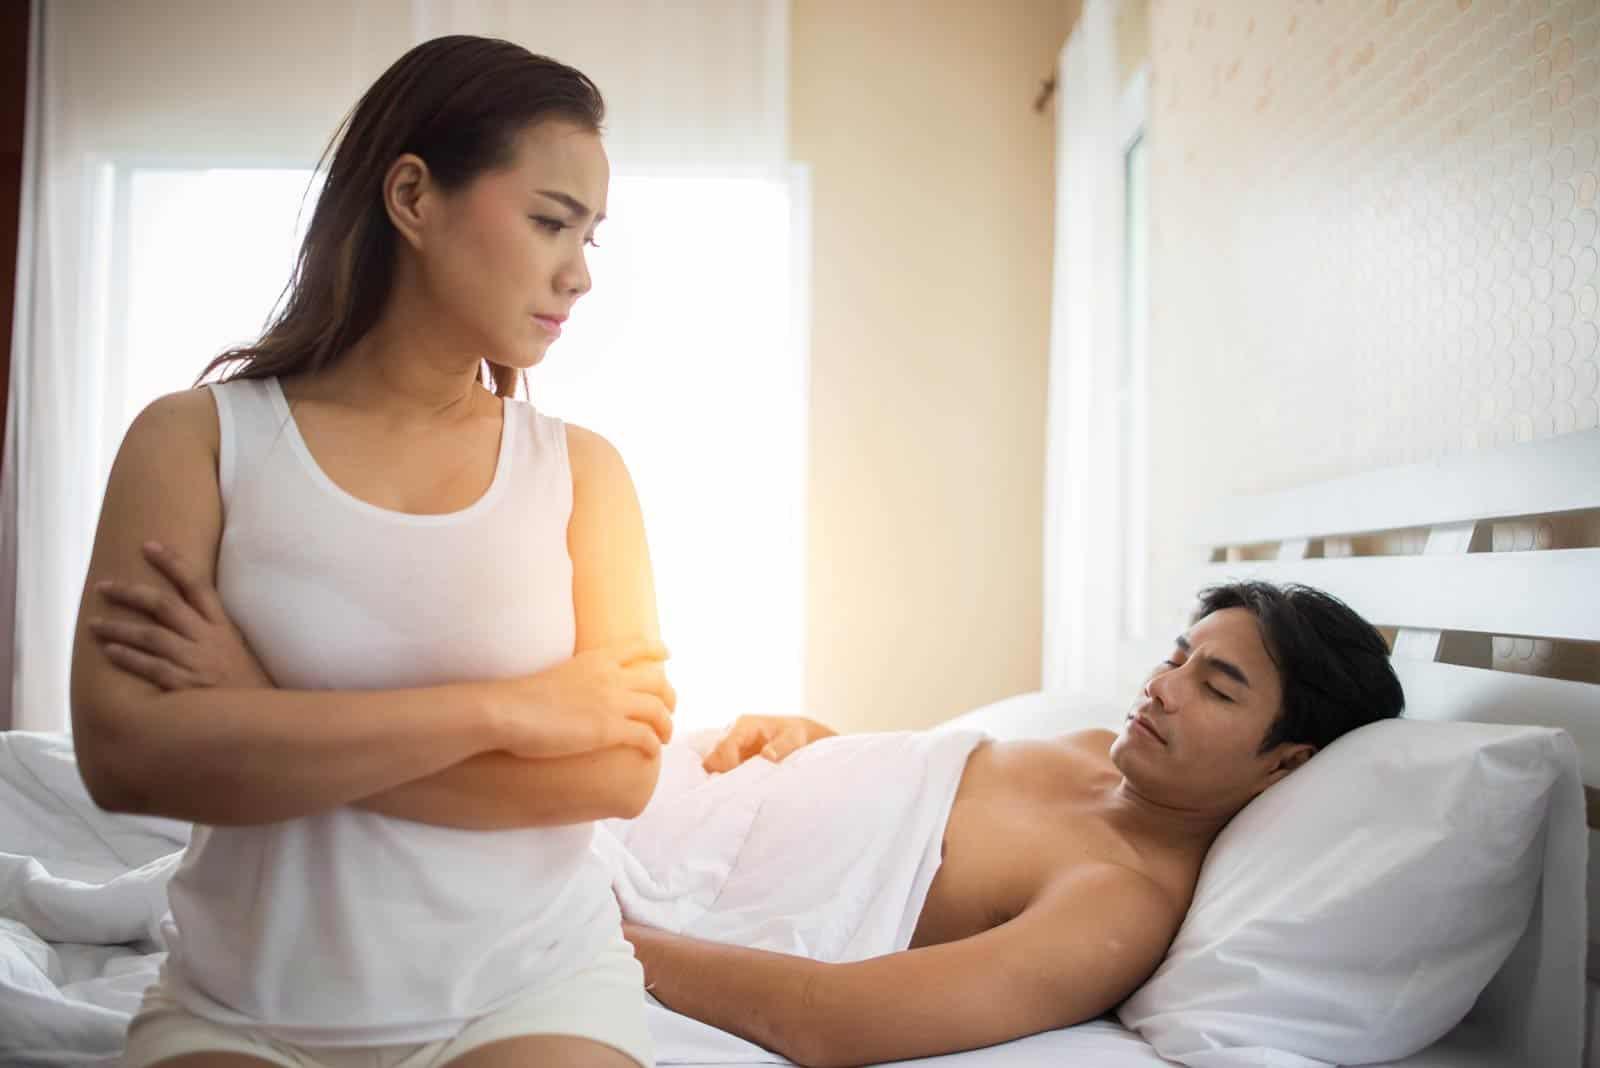 Tablete za seks